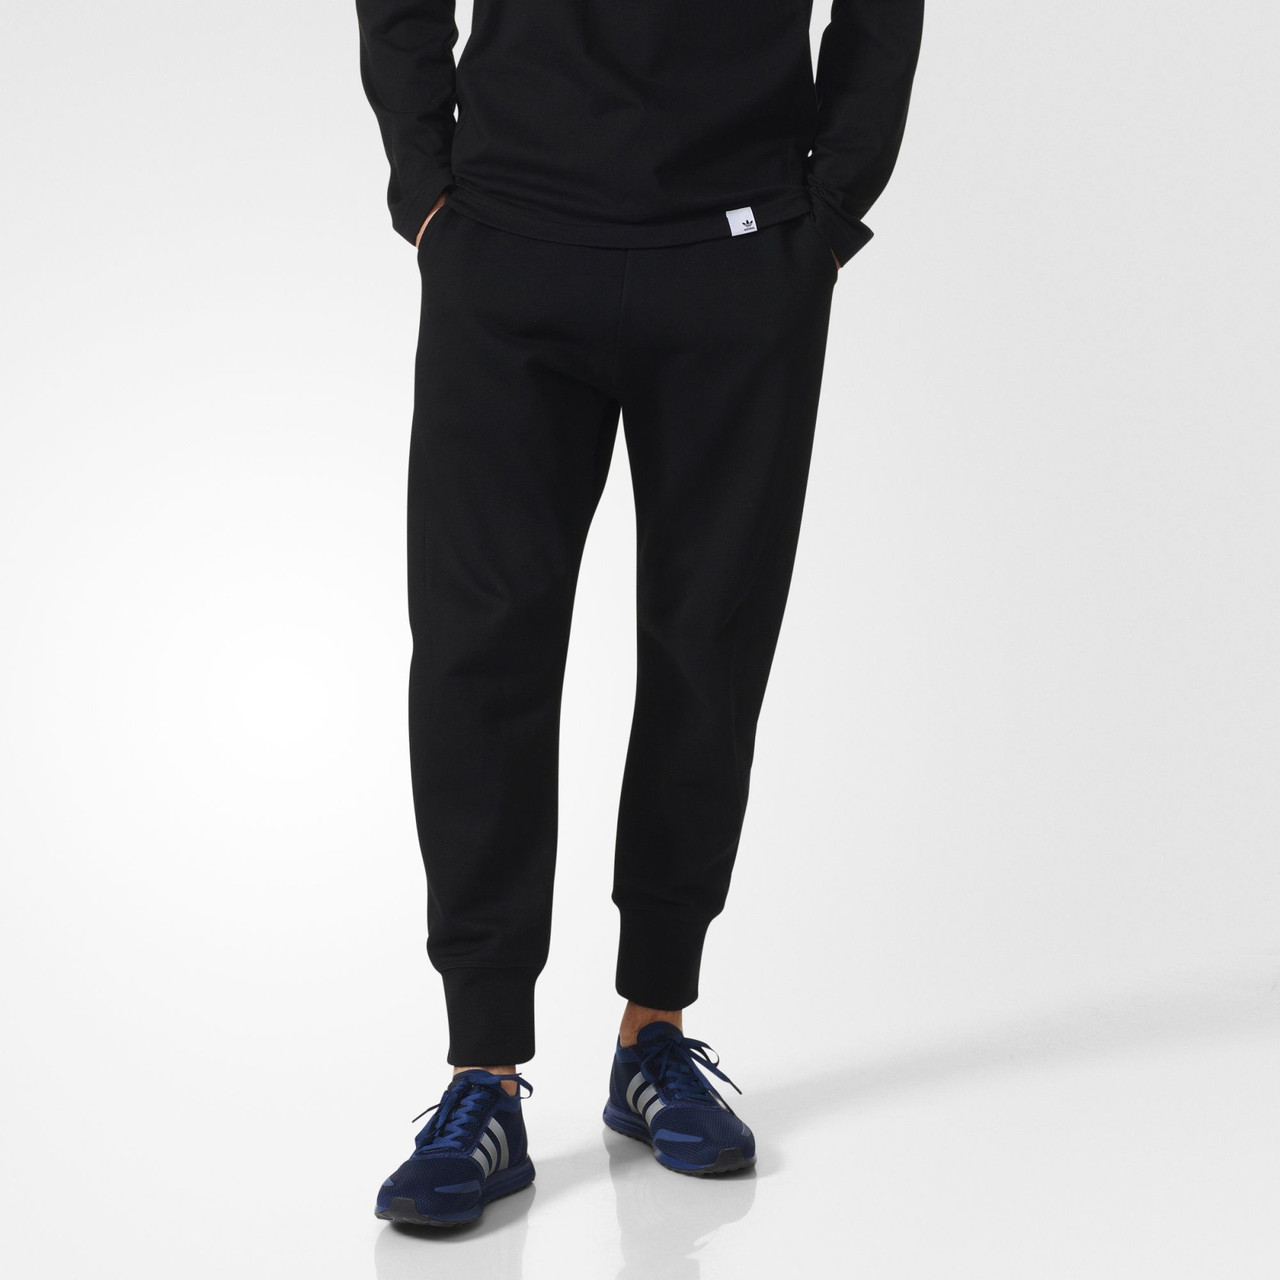 Мужские брюки Adidas Originals XBYO (Артикул  BQ3108) - Интернет-магазин  «Эксперт a63a1ea8a71